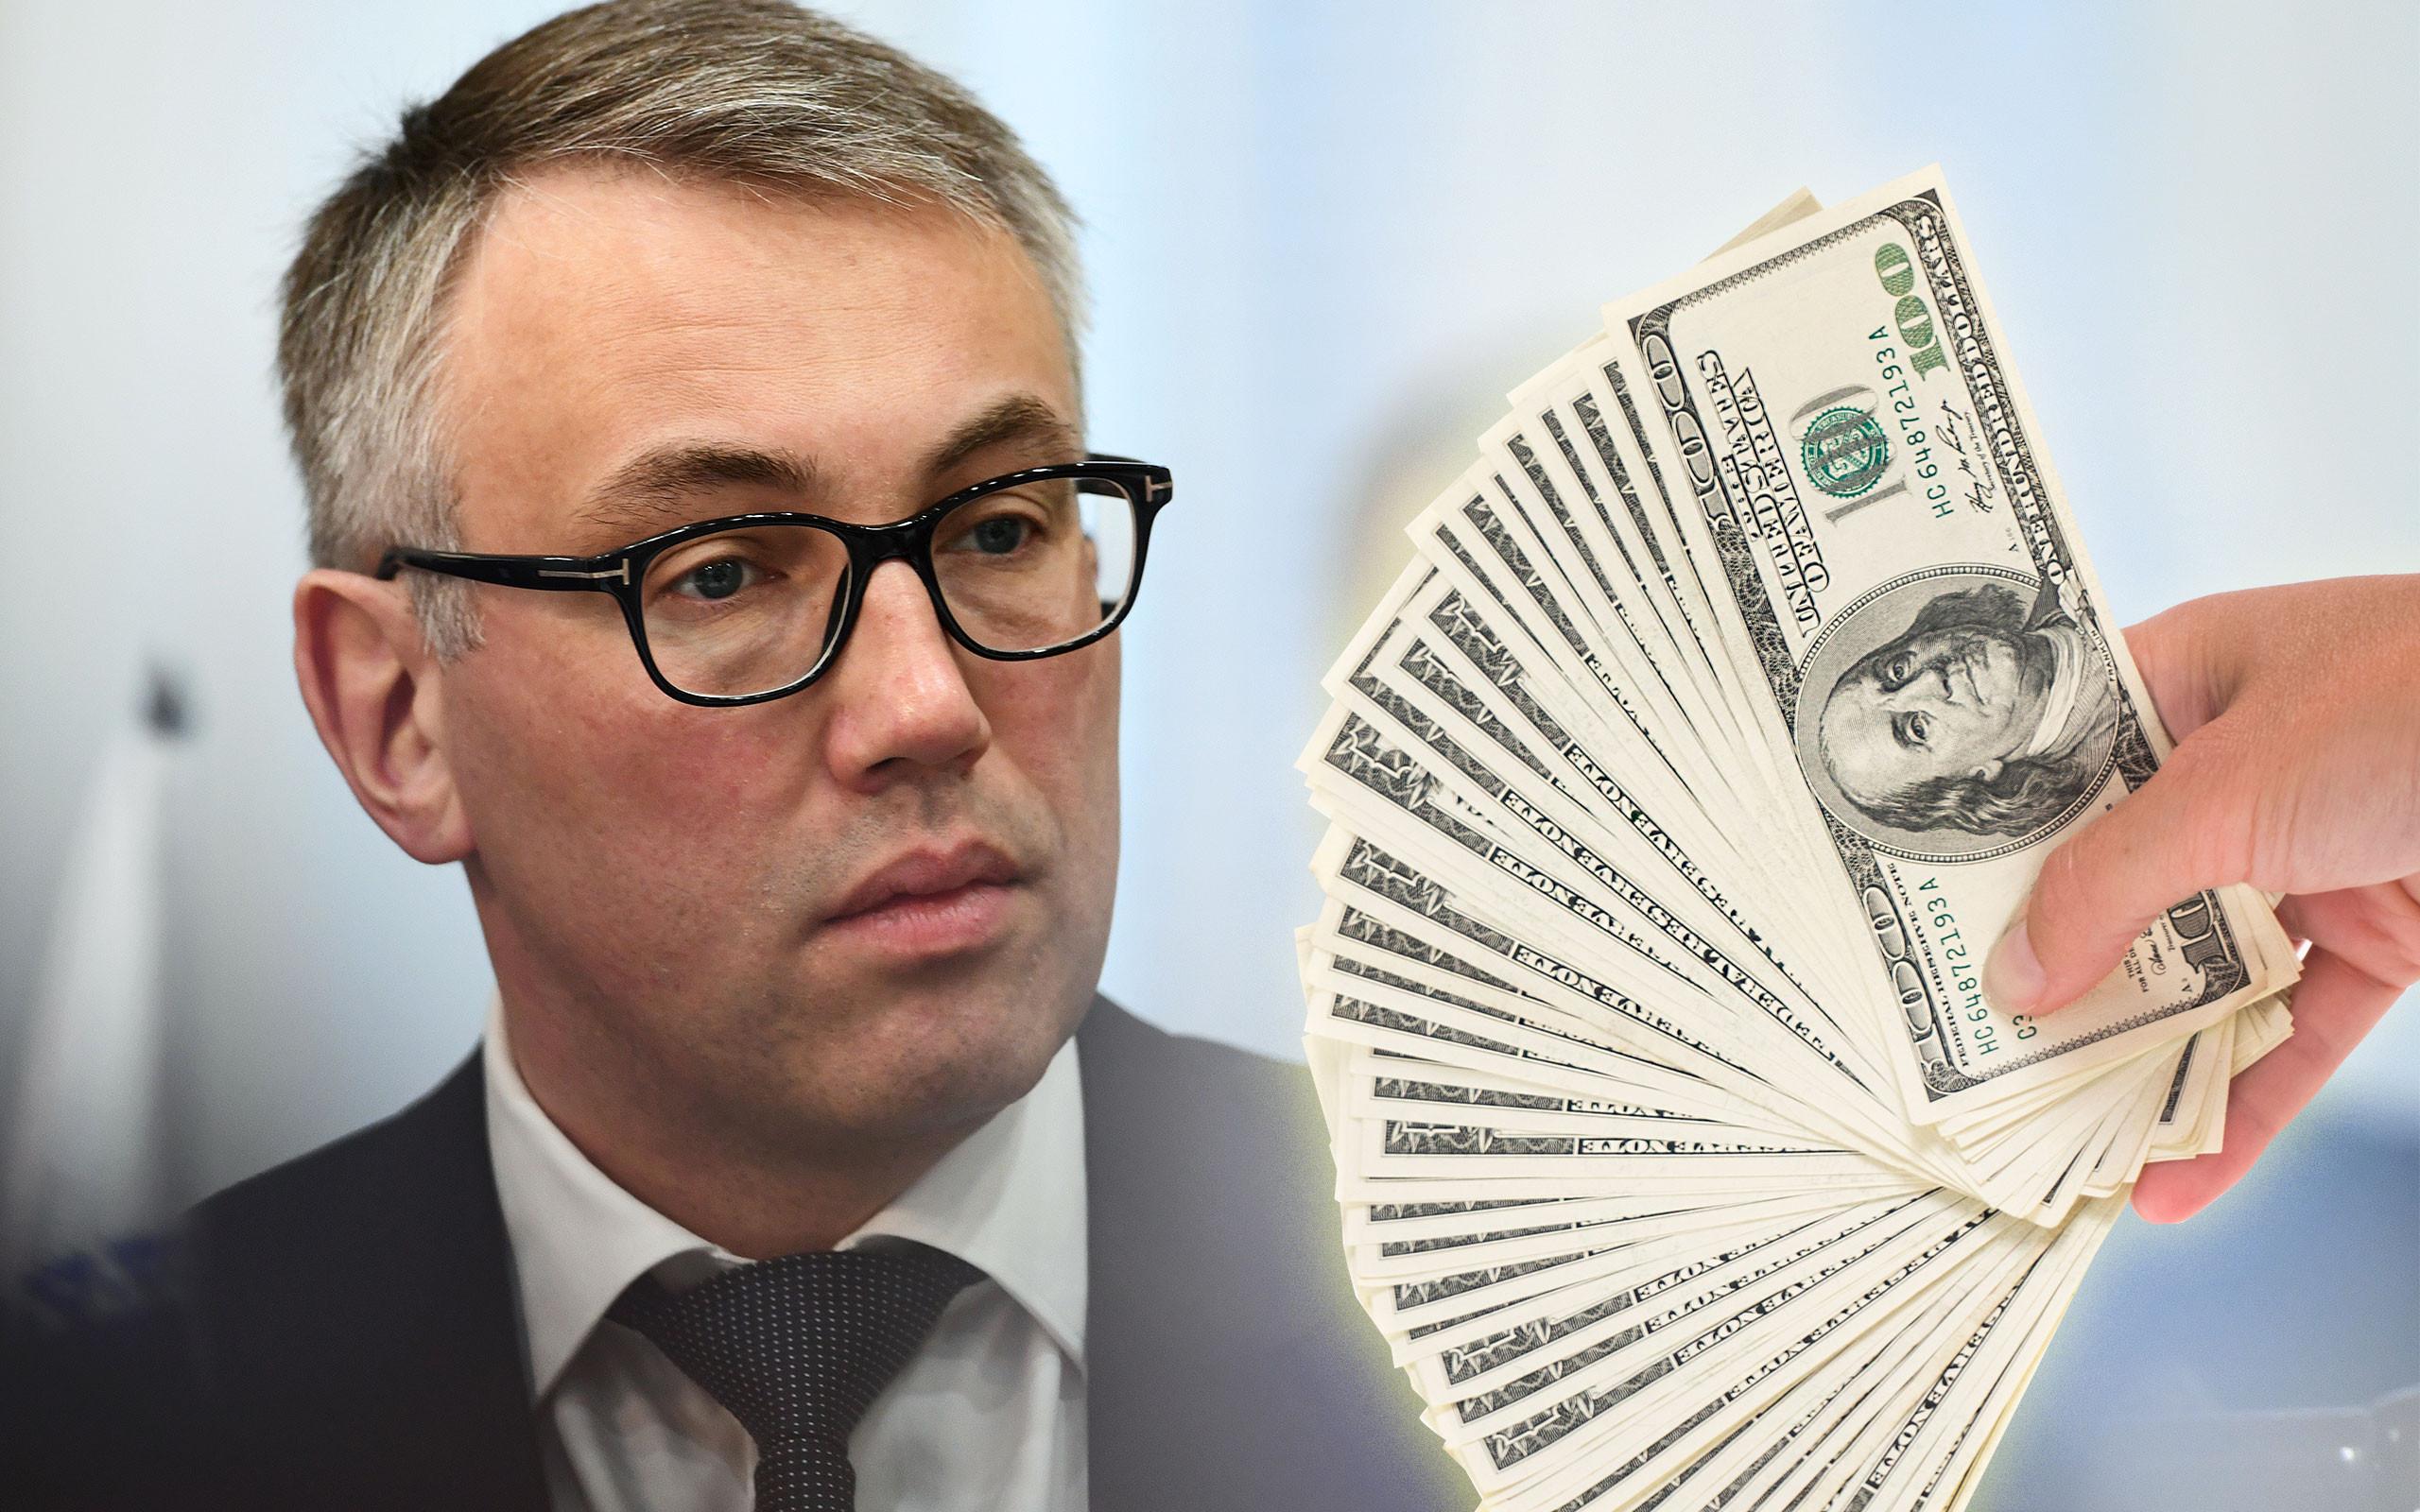 "<p>Фото: &copy; РИА Новости<span>/Евгений Биятов, </span>Flickr/<a href=""https://www.flickr.com/photos/pictures-of-money/17121923990/"" target=""_blank""><span>Pictures of Money</span></a></p>"